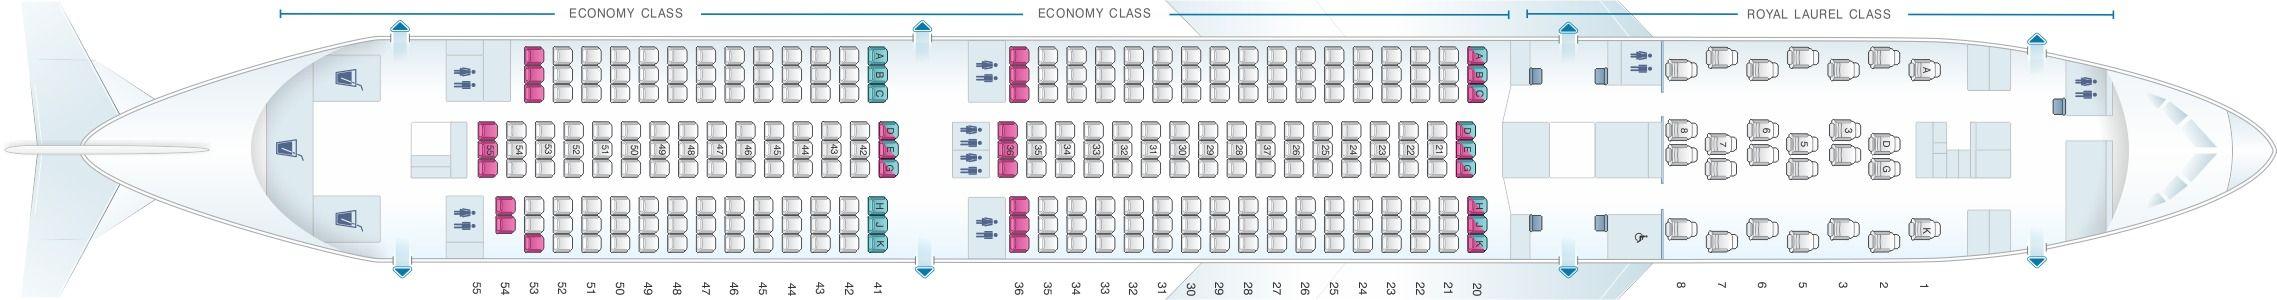 EVA Air Fleet Boeing 7879 Dreamliner Details and Pictures